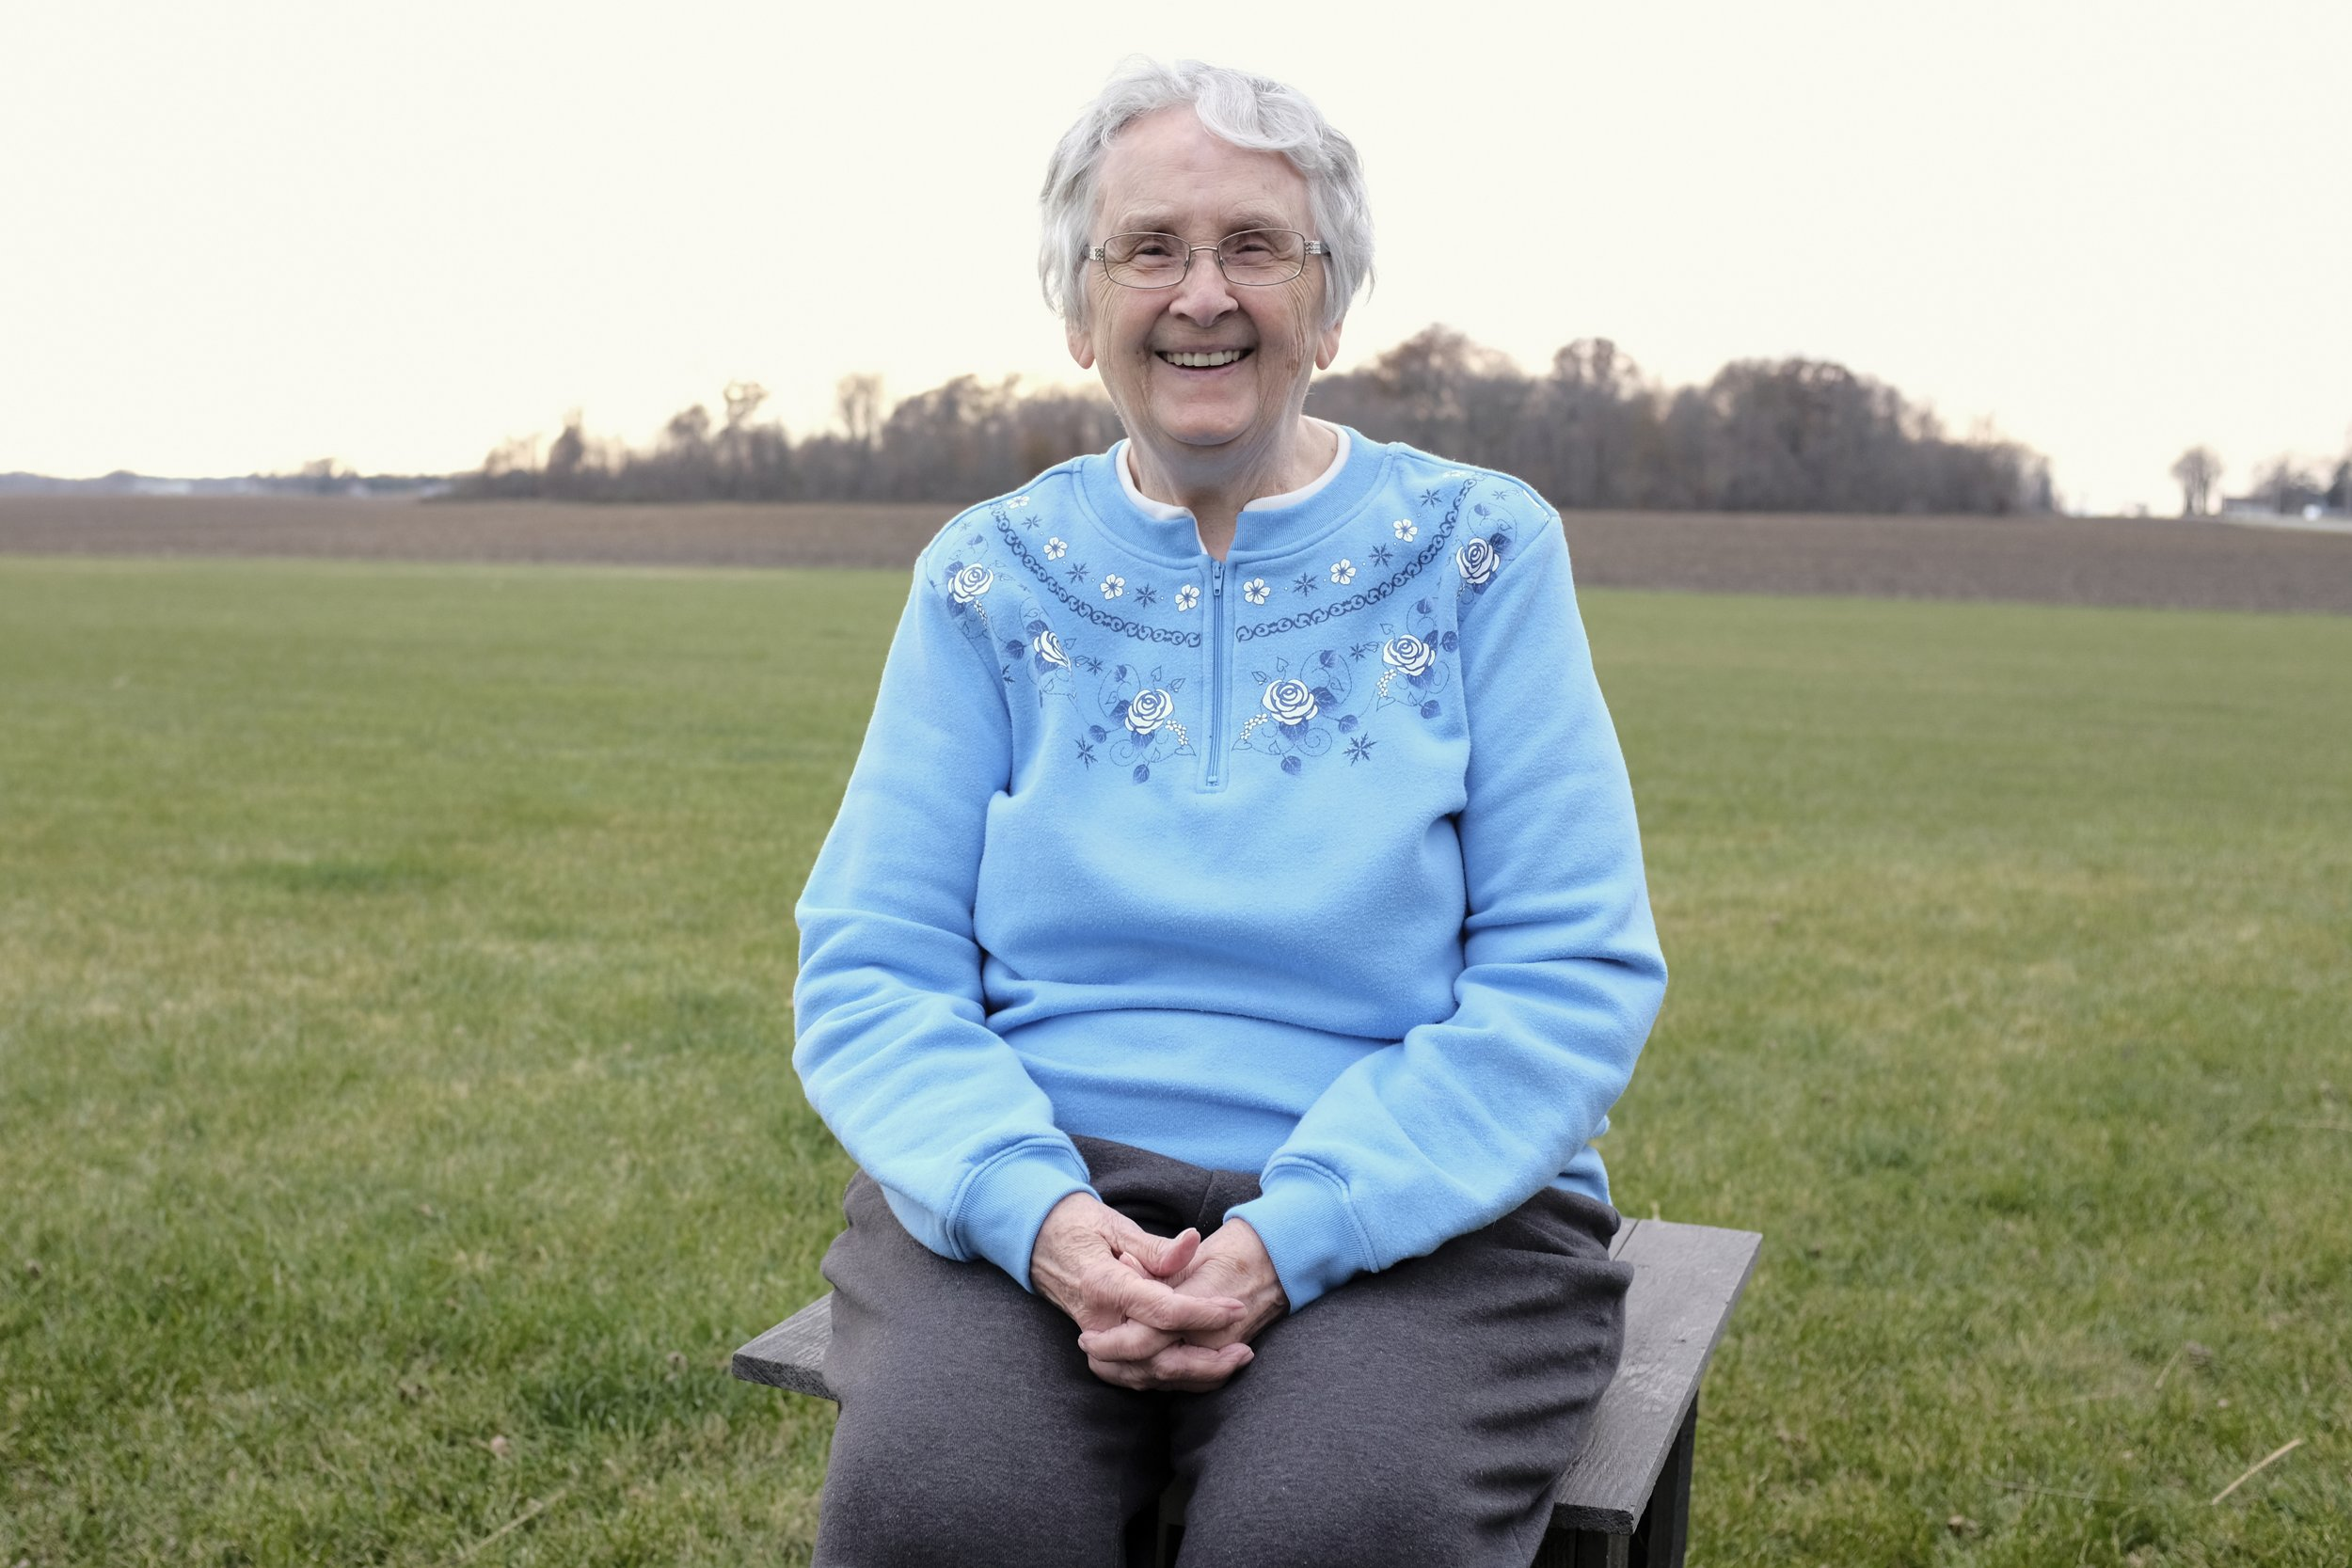 Grandma turned 89 this year.